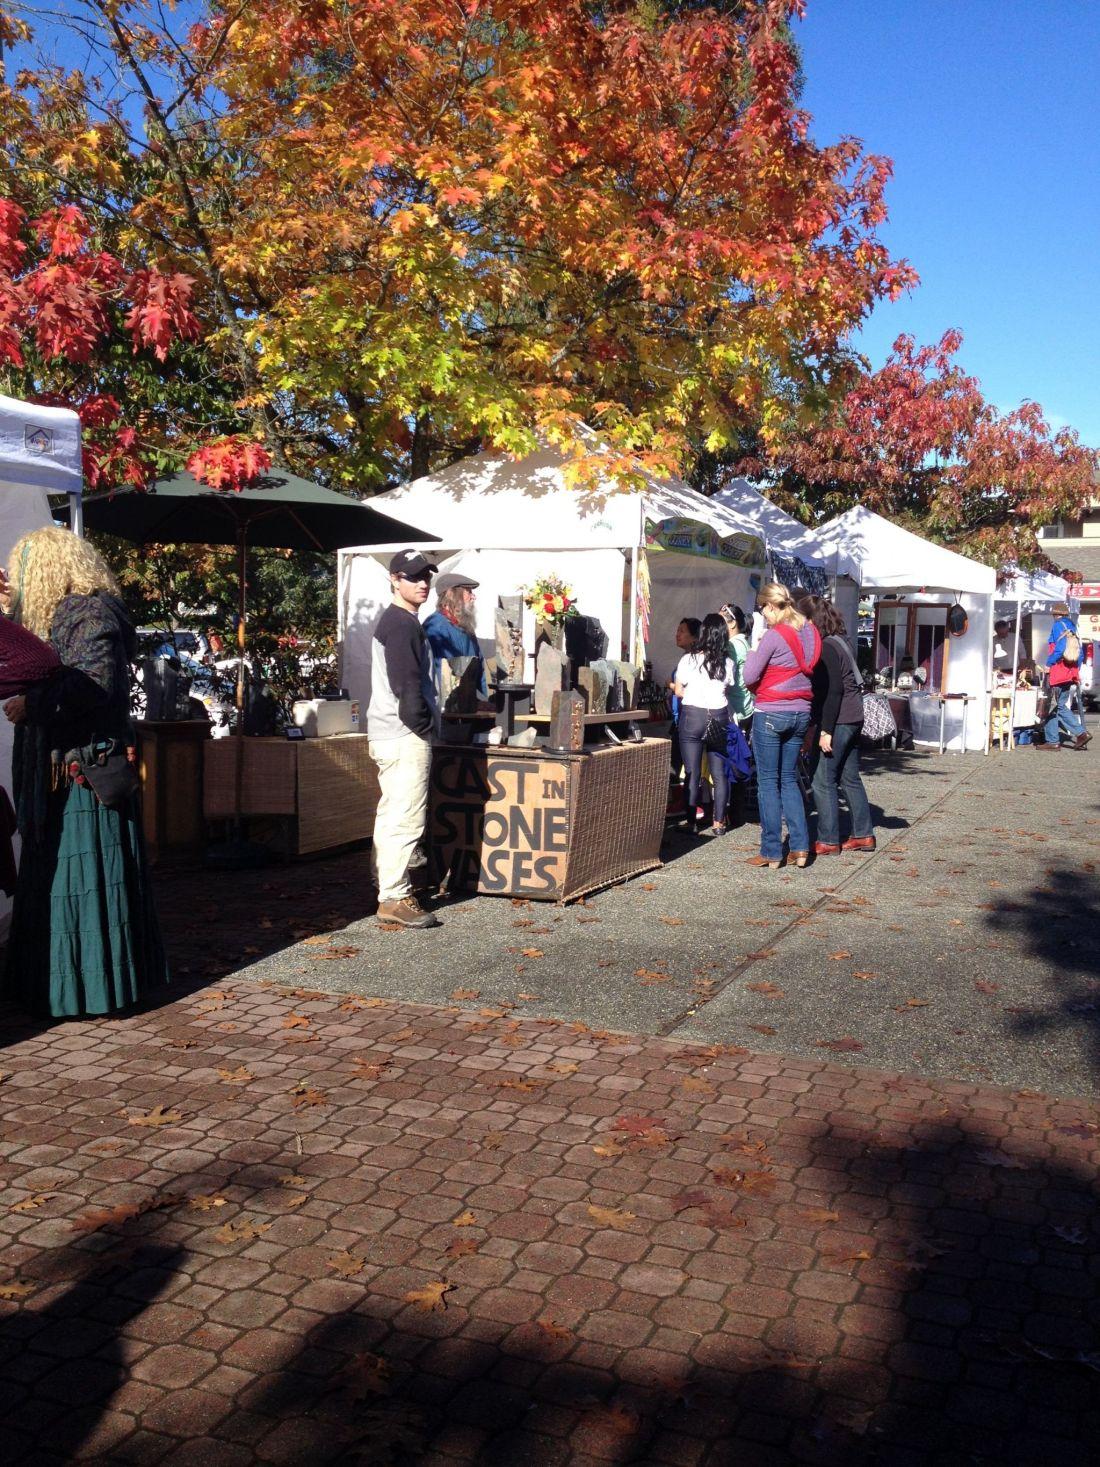 The market on Salt Spring Island